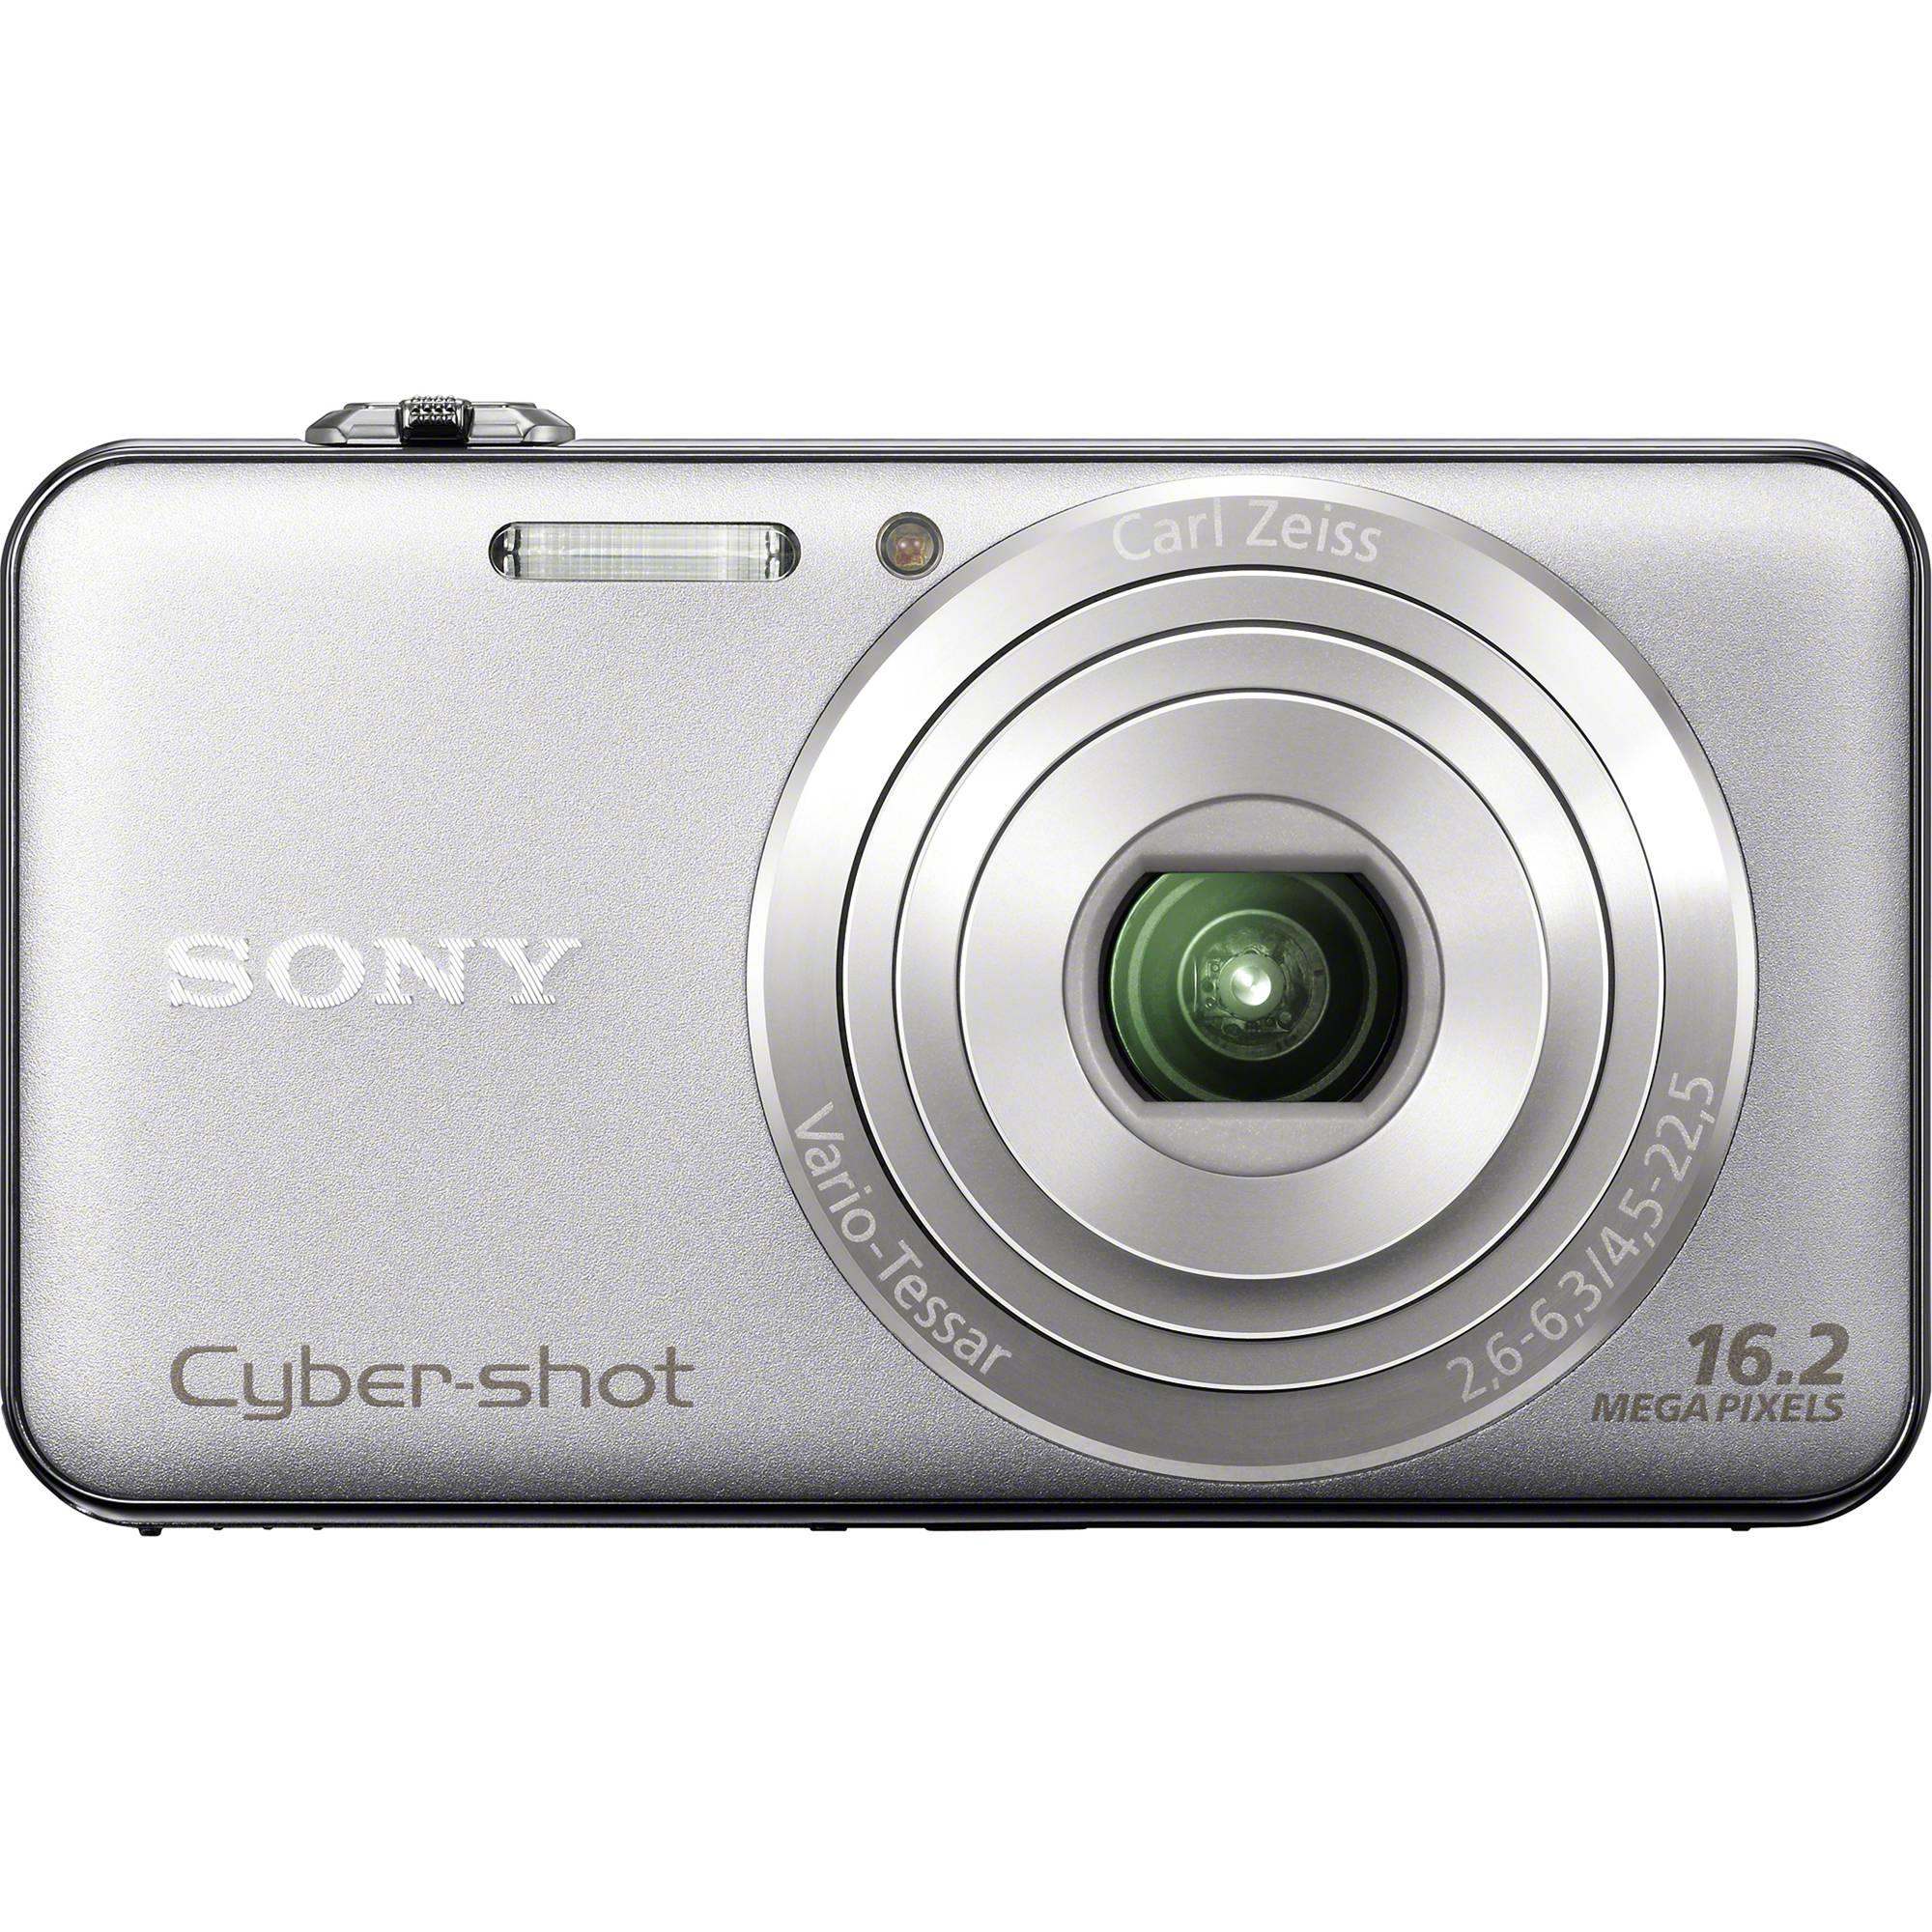 sony cyber shot dsc wx50 digital camera silver dscwx50 b h rh bhphotovideo com sony cyber shot dsc wx50 manual sony cyber shot dsc-wx50 manual download